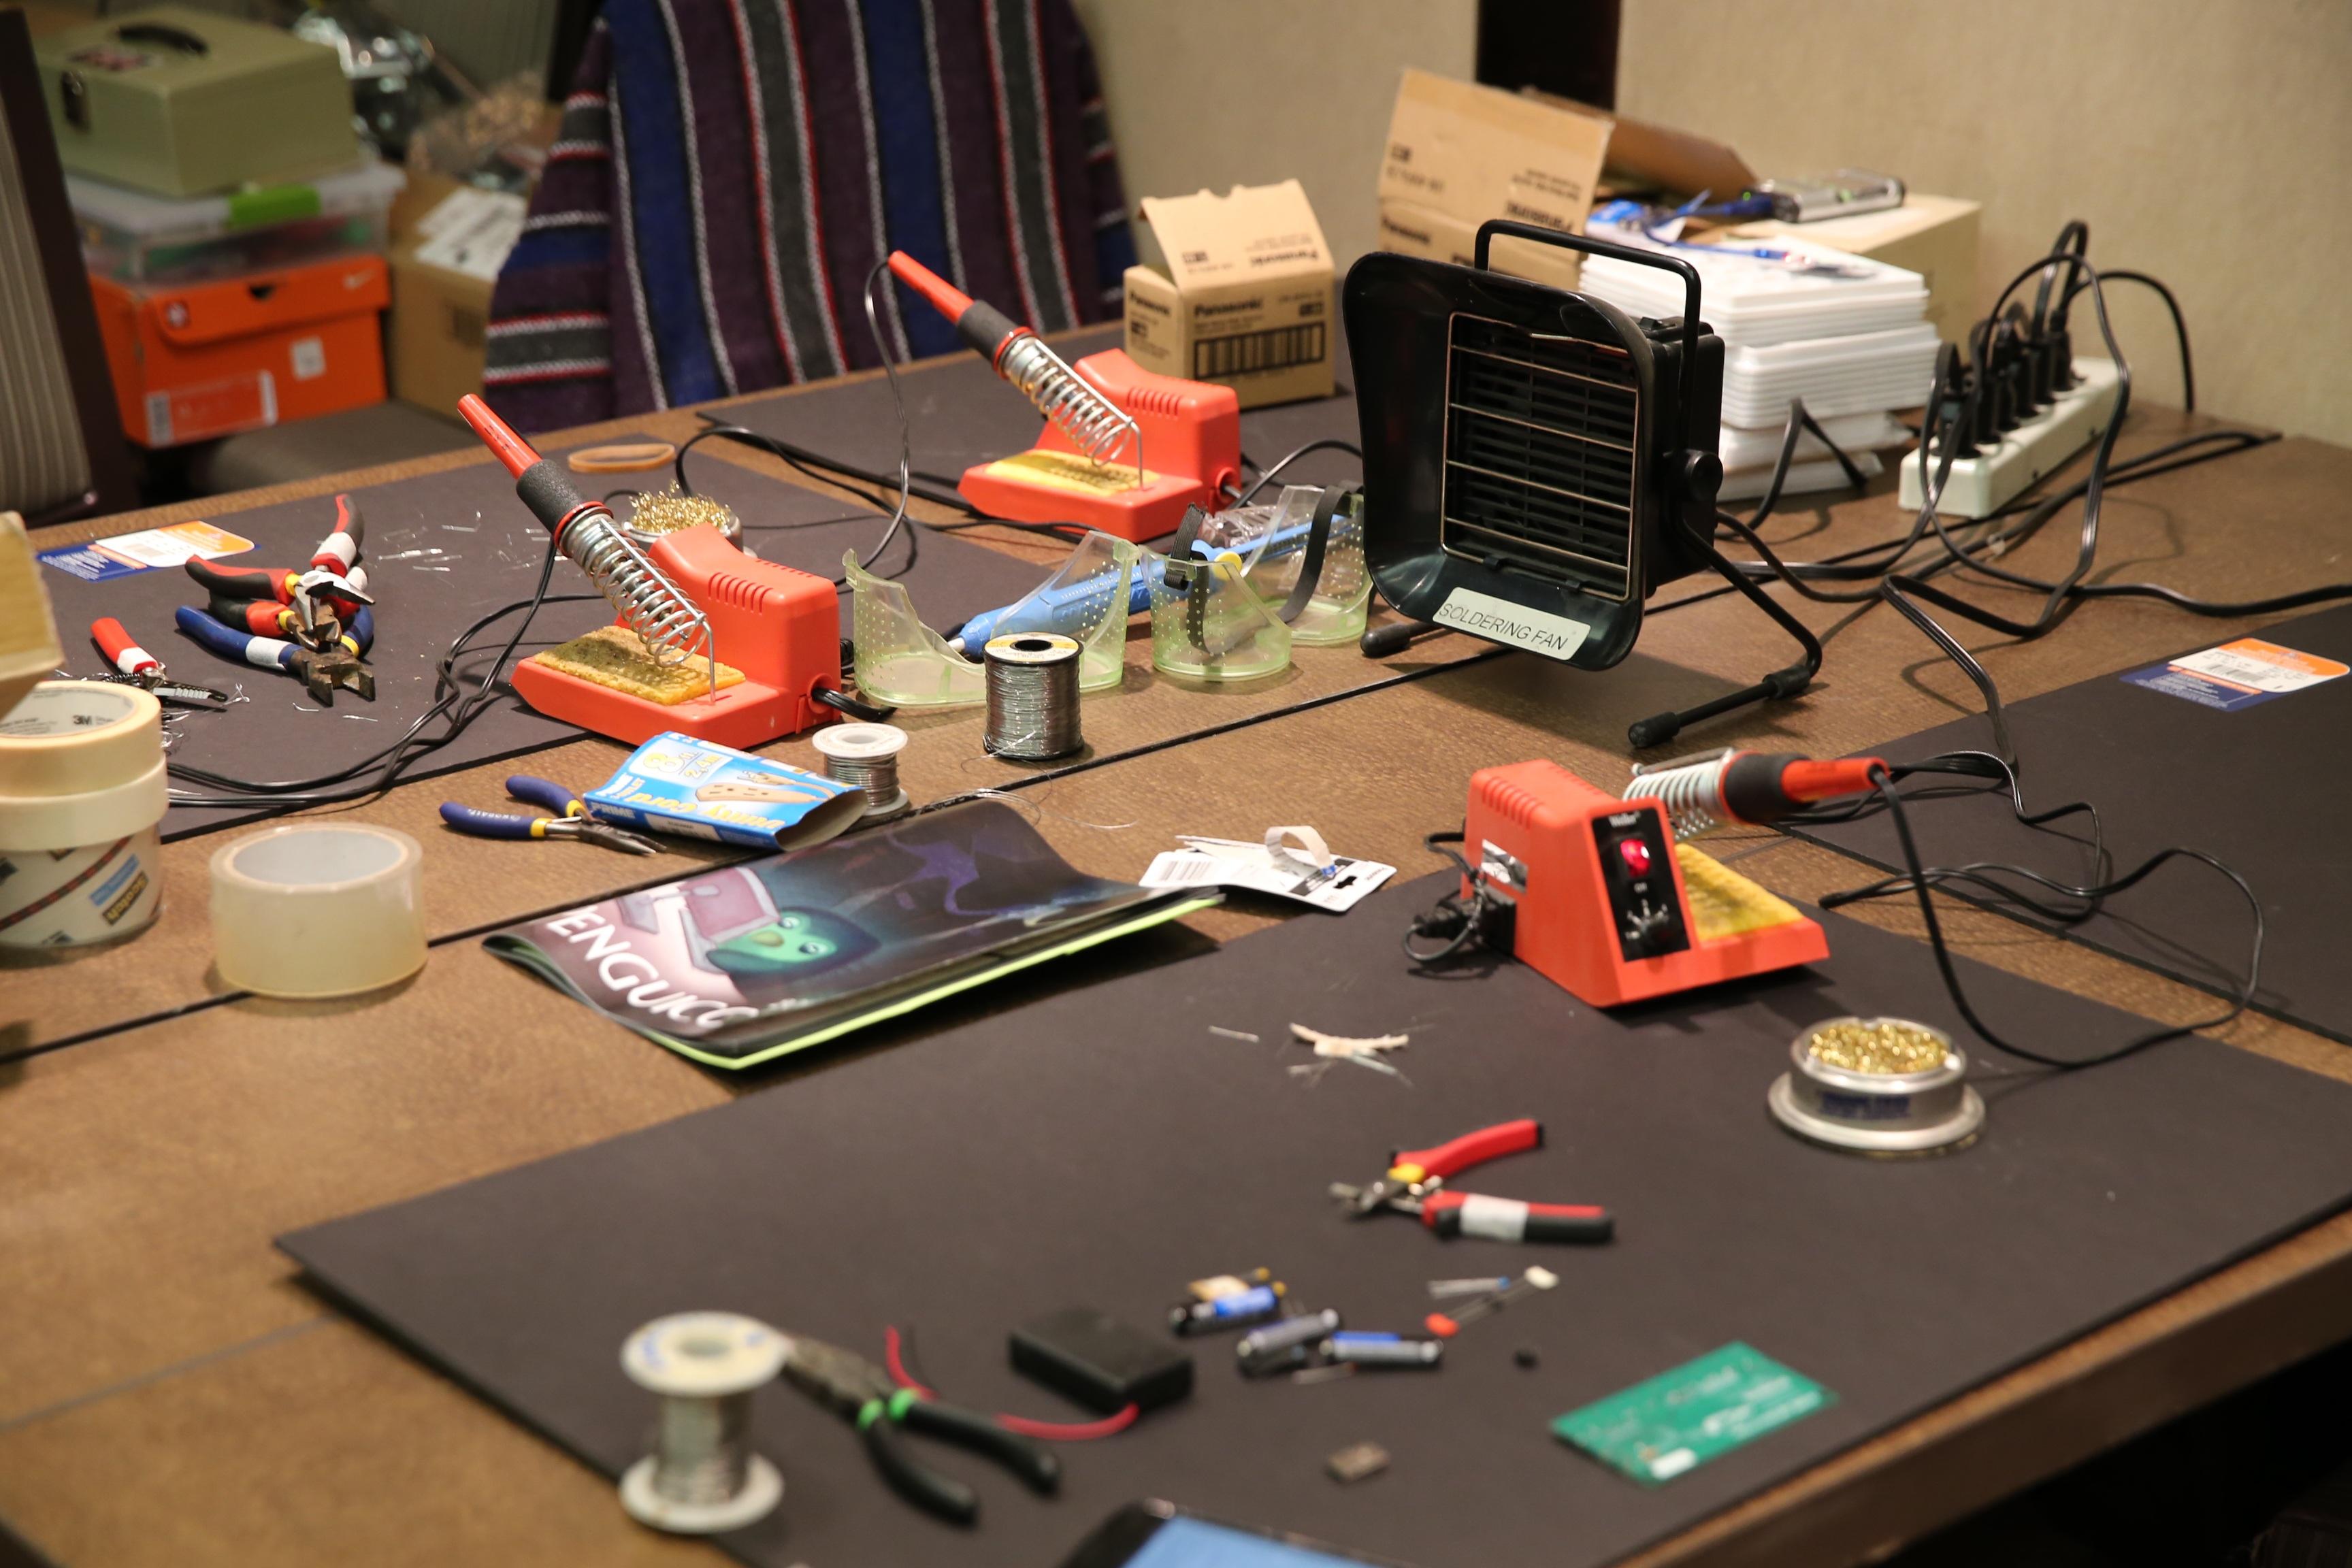 Free Images : technology, art, electronics, design, screenshot ...